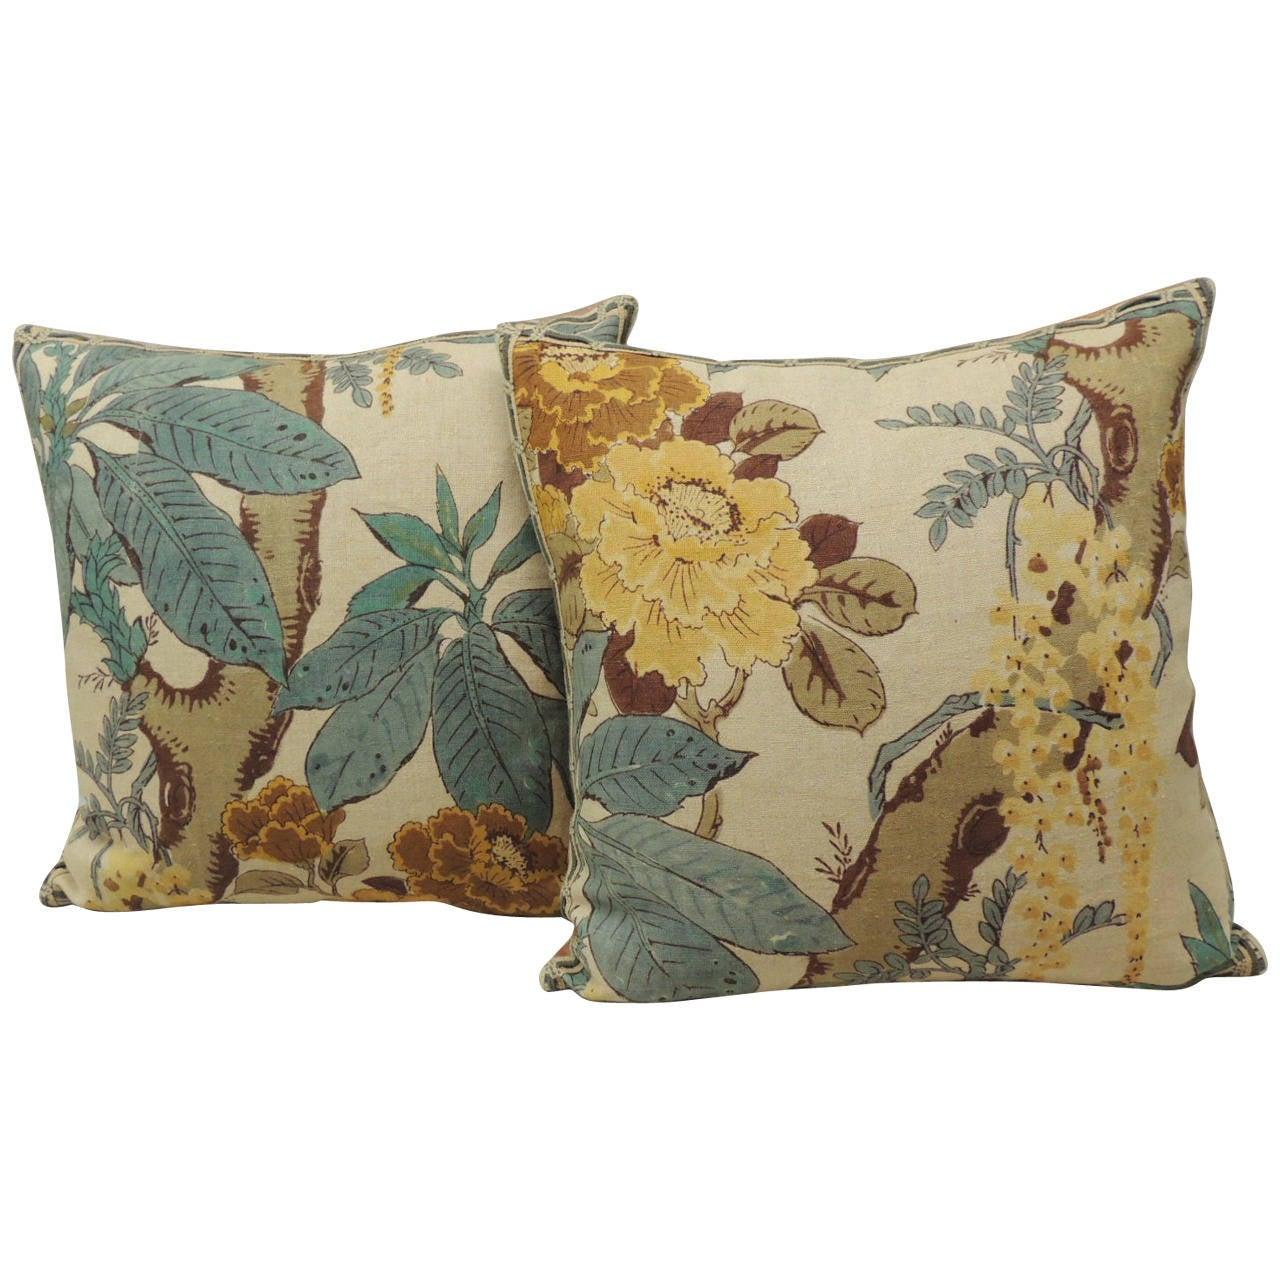 Pair of Floral Linen Decorative Pillows